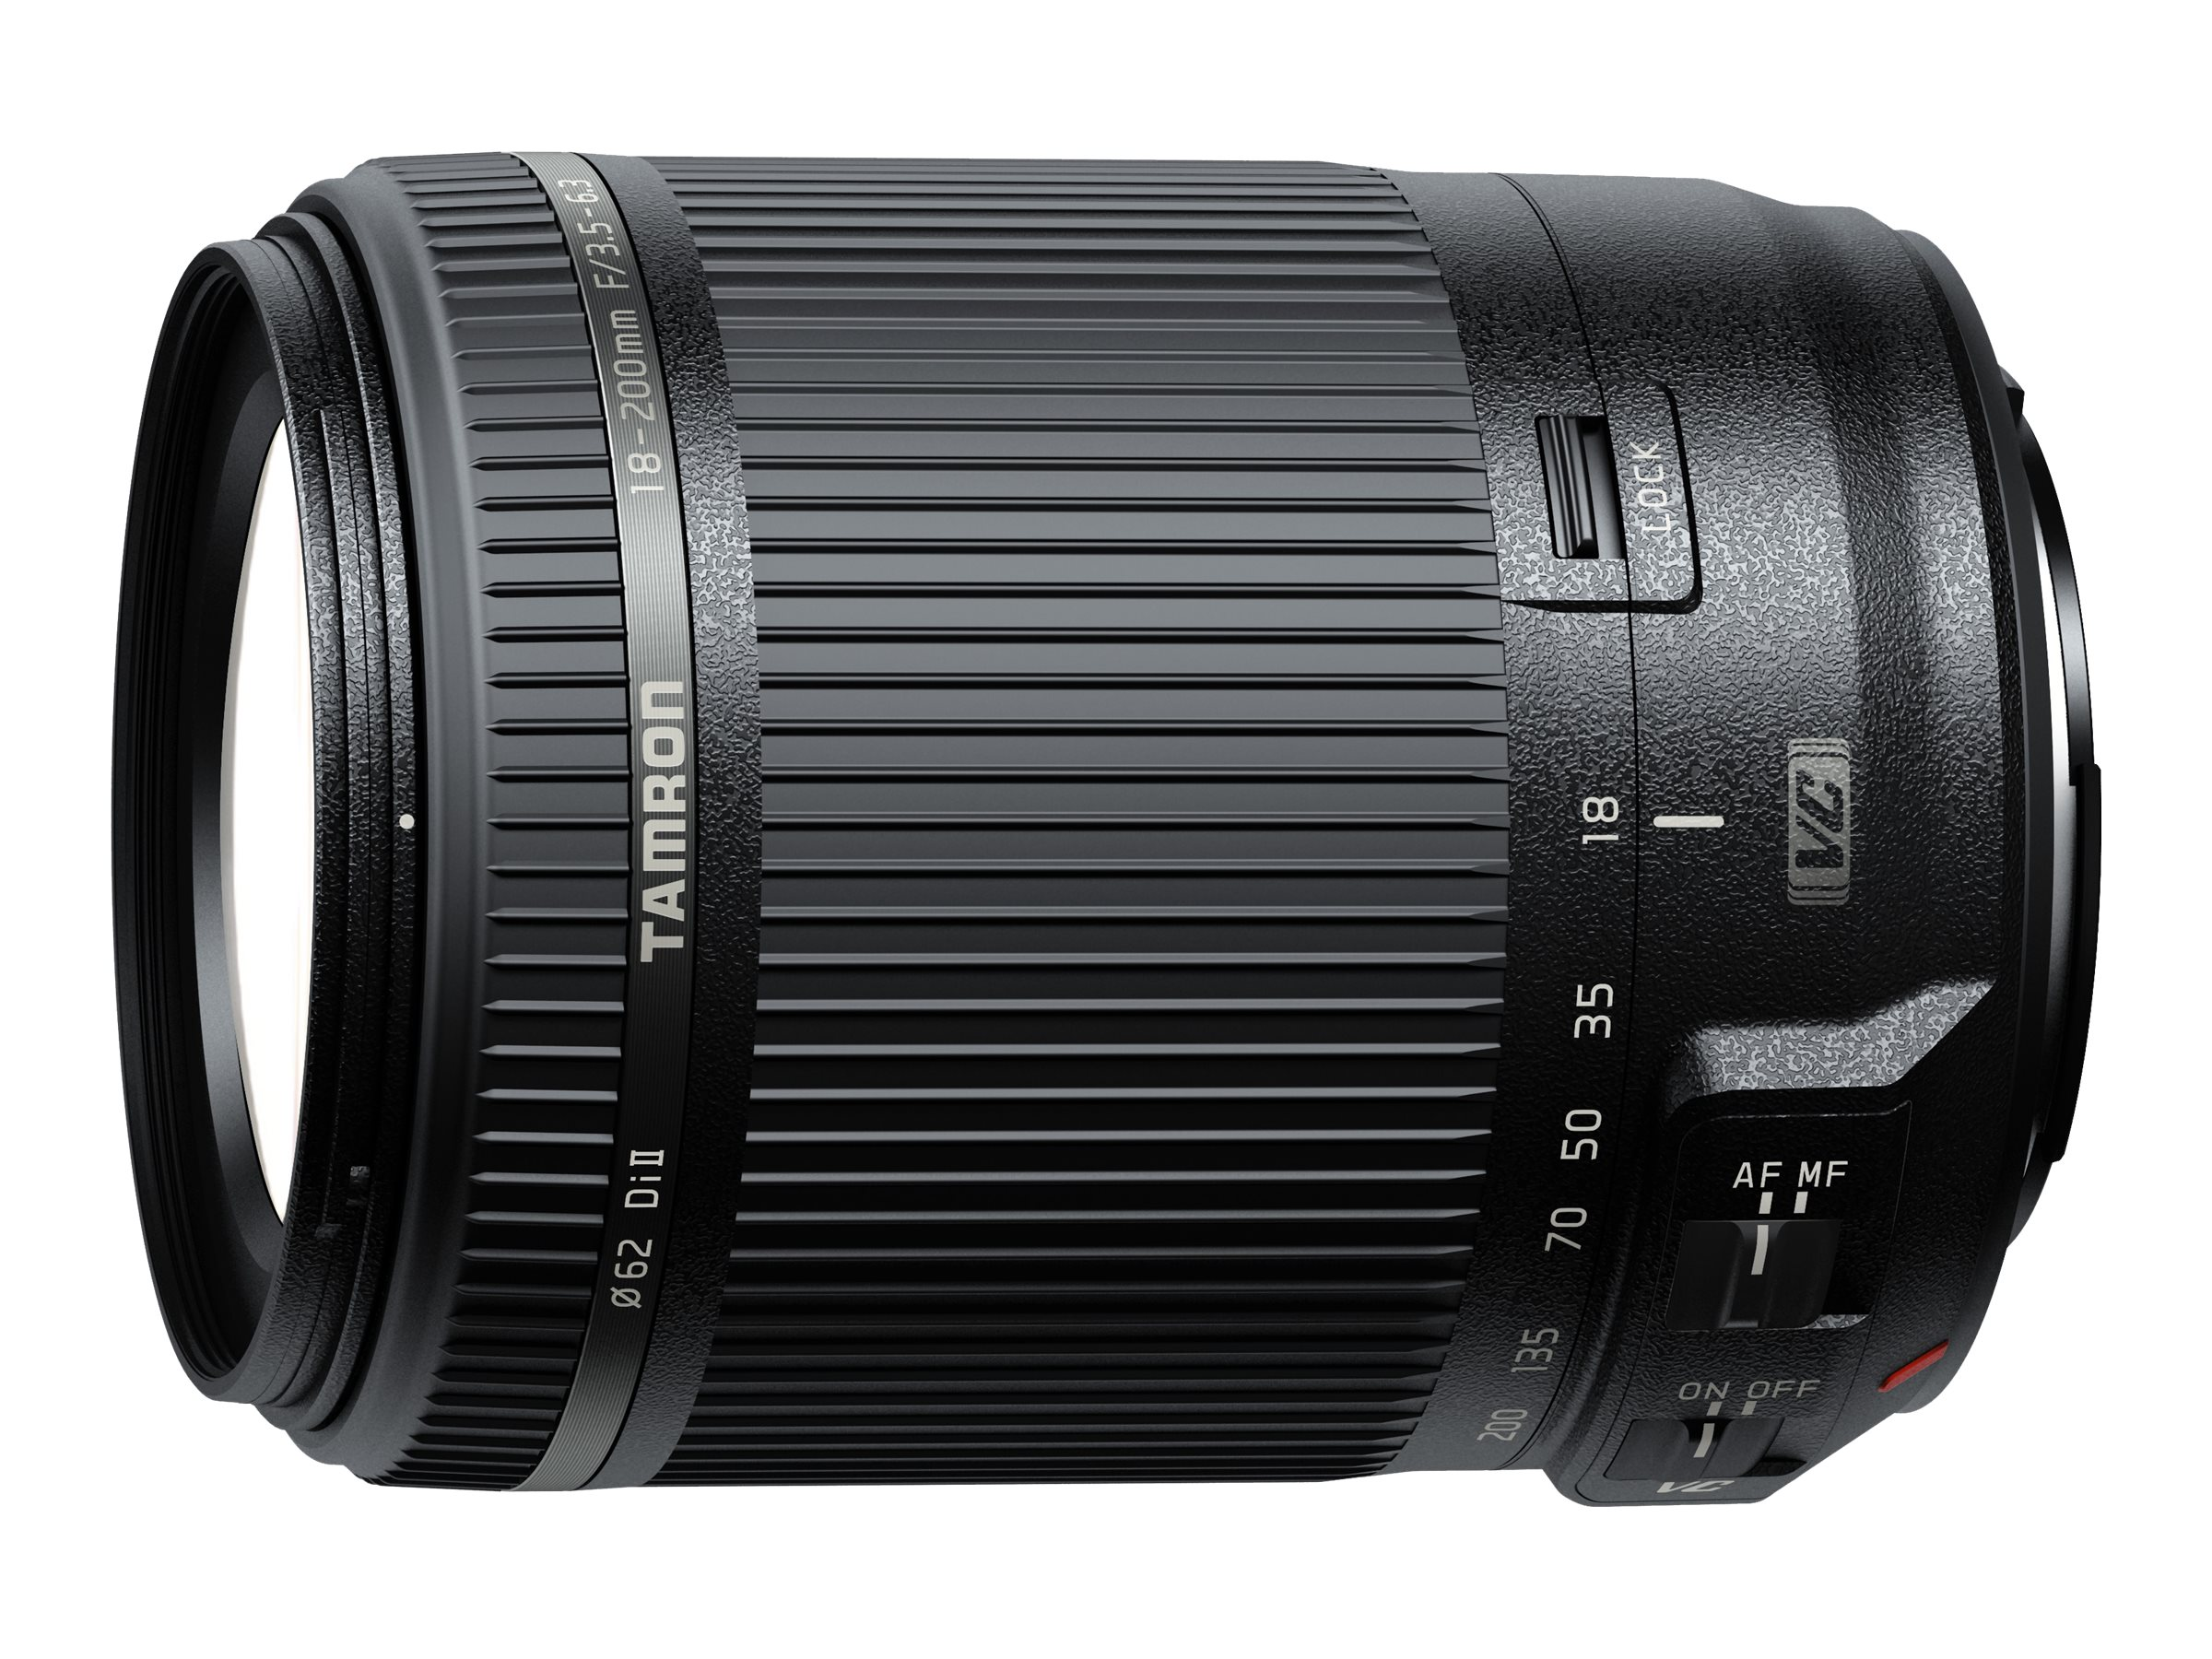 Tamron B018 - Zoomobjektiv - 18 mm - 200 mm - f/3.5-6.3 Di II VC - Canon EF/EF-S